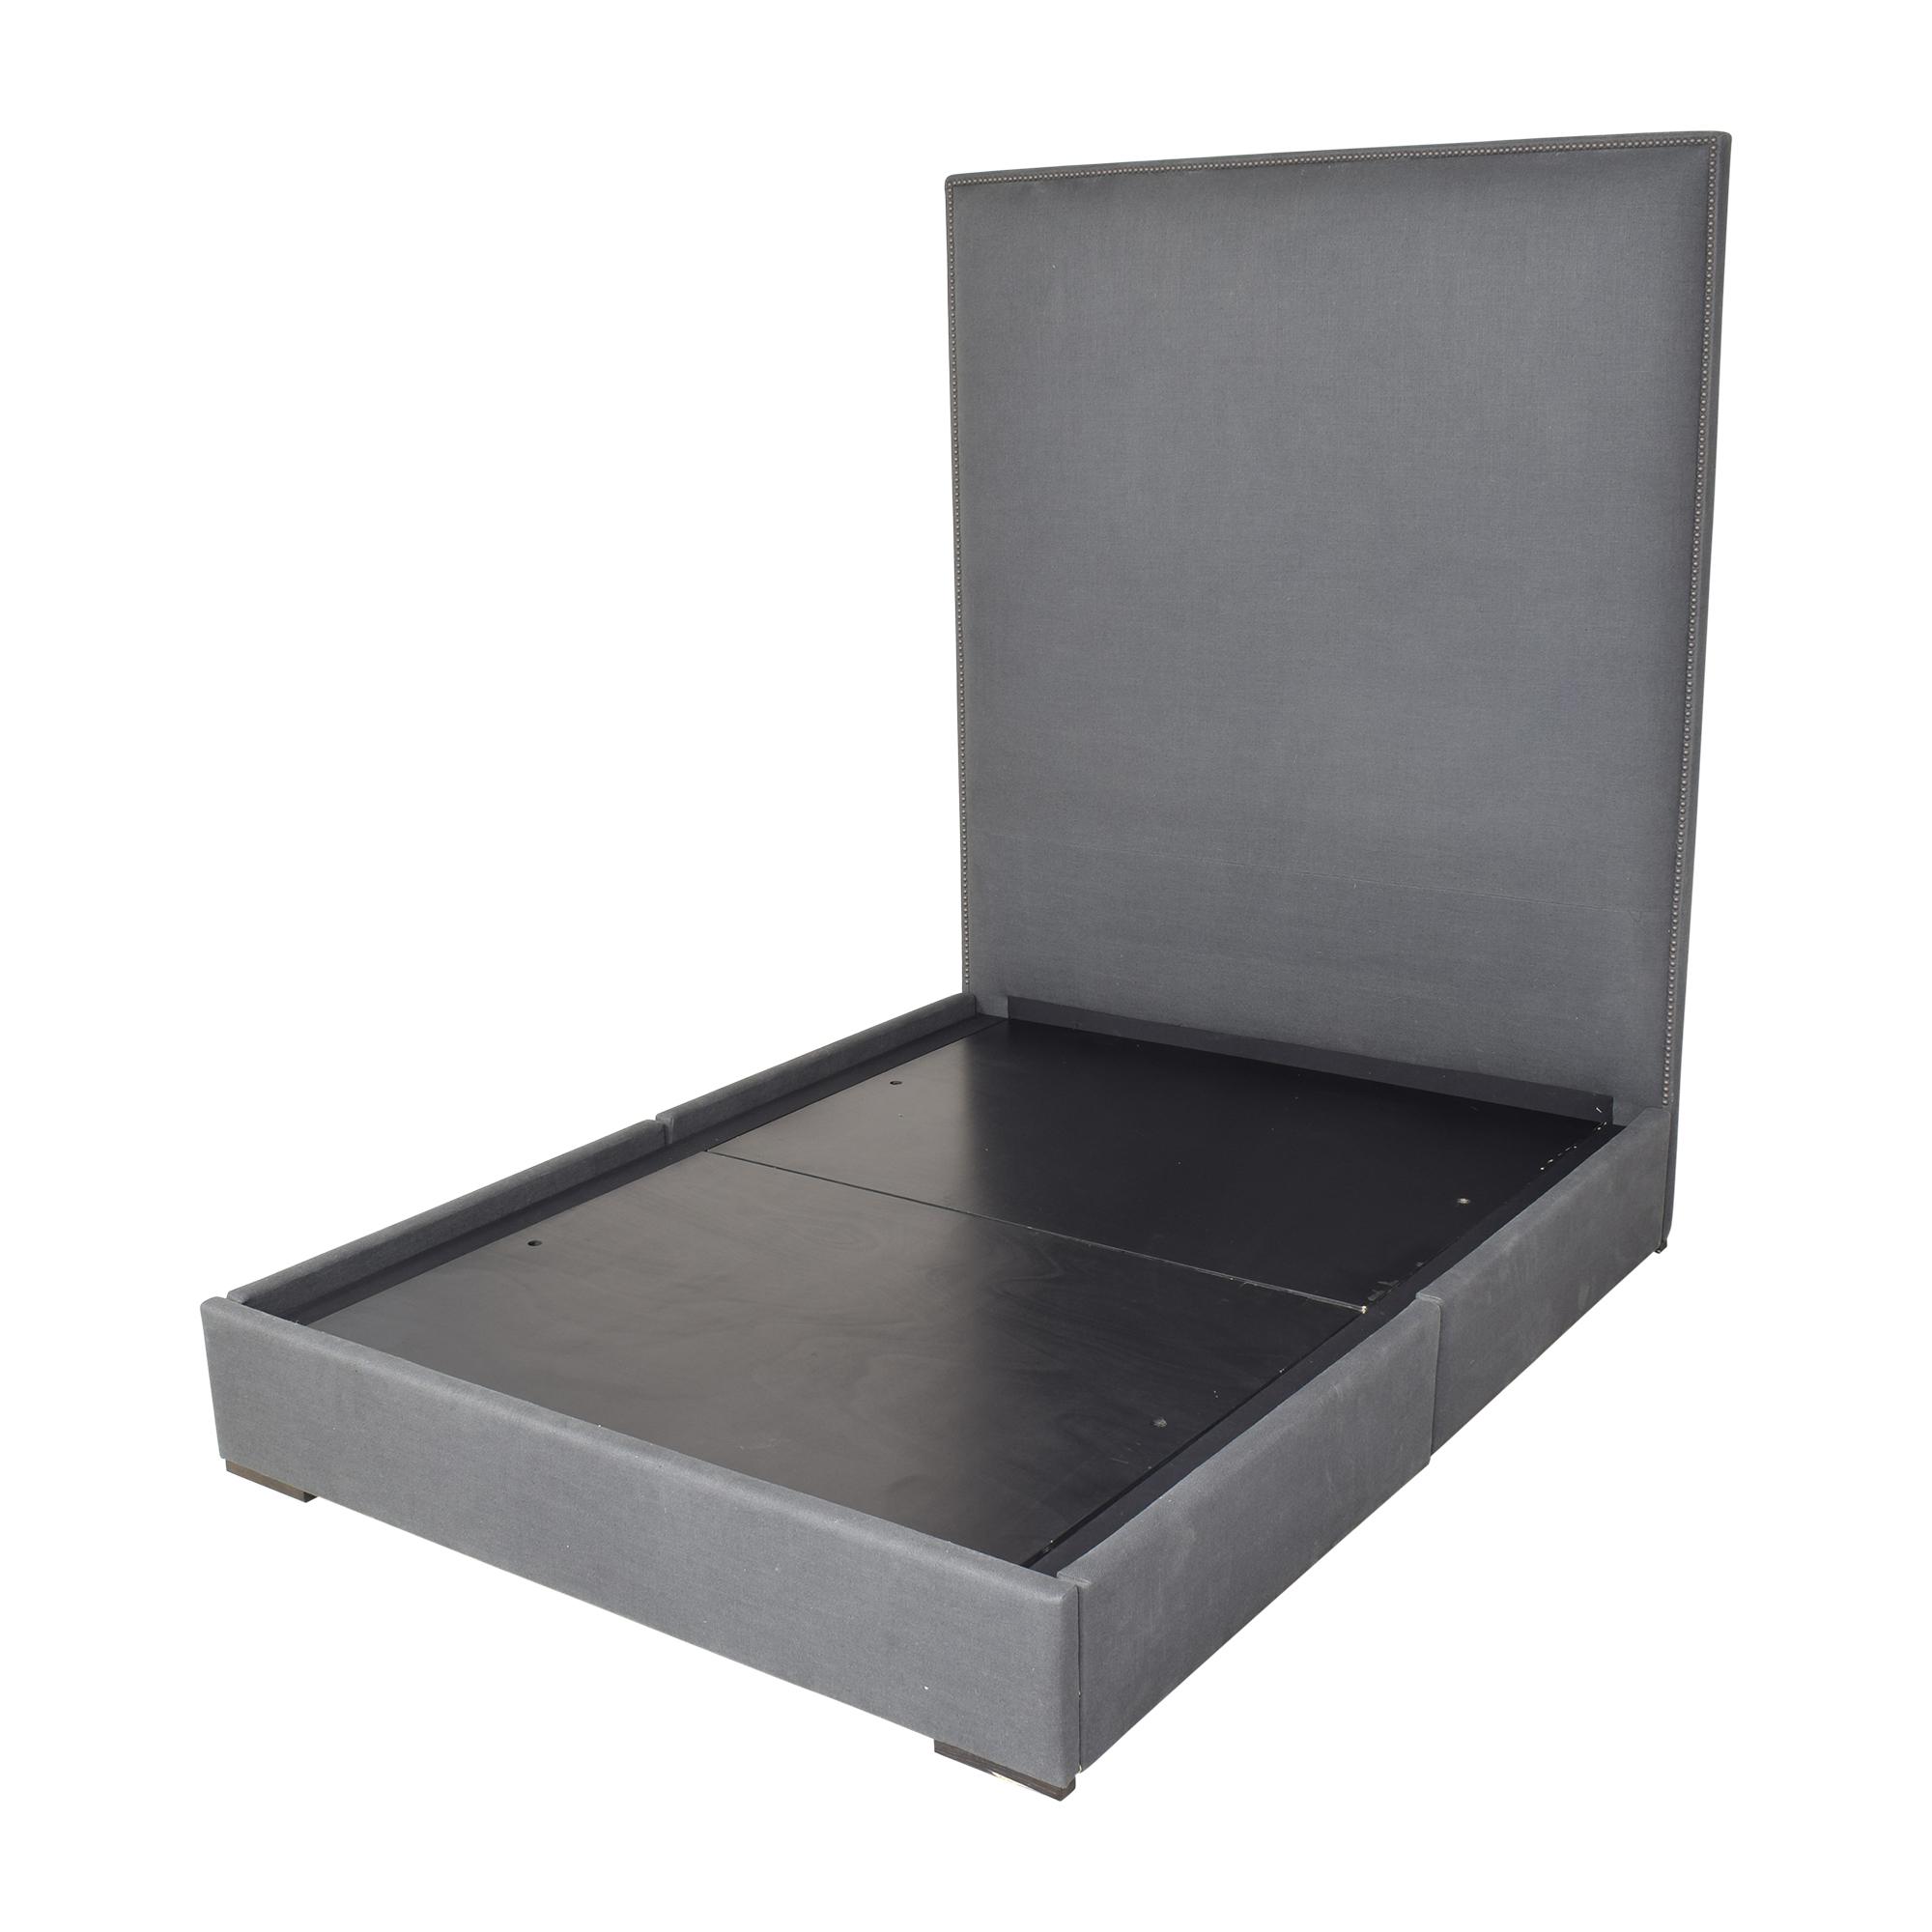 buy Restoration Hardware Lawson Panel Nontufted Storage Bed with Nailheads Restoration Hardware Beds